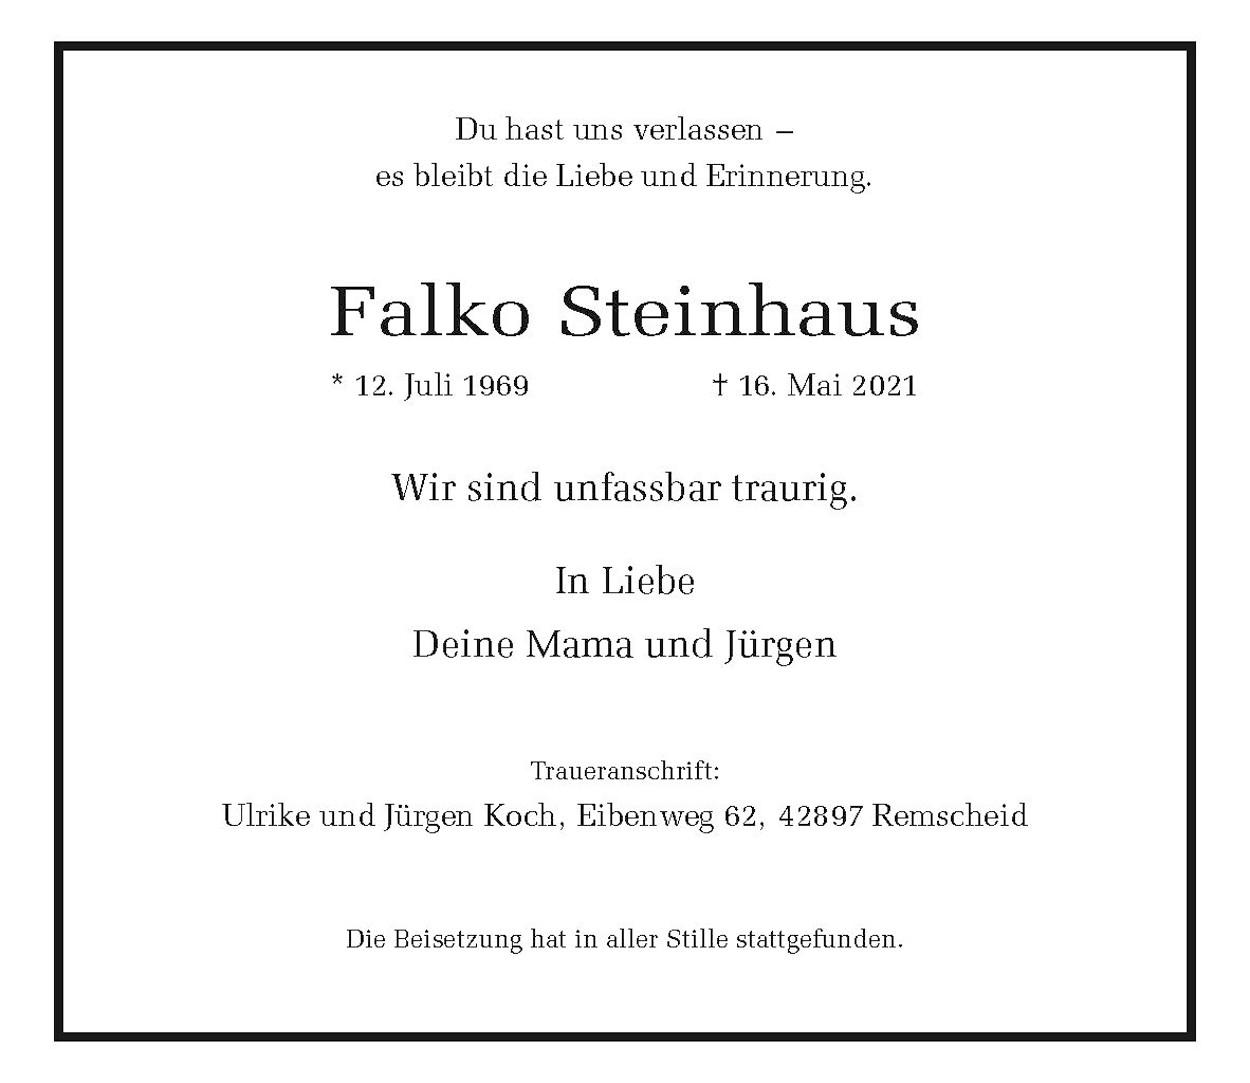 Falko Steinhaus